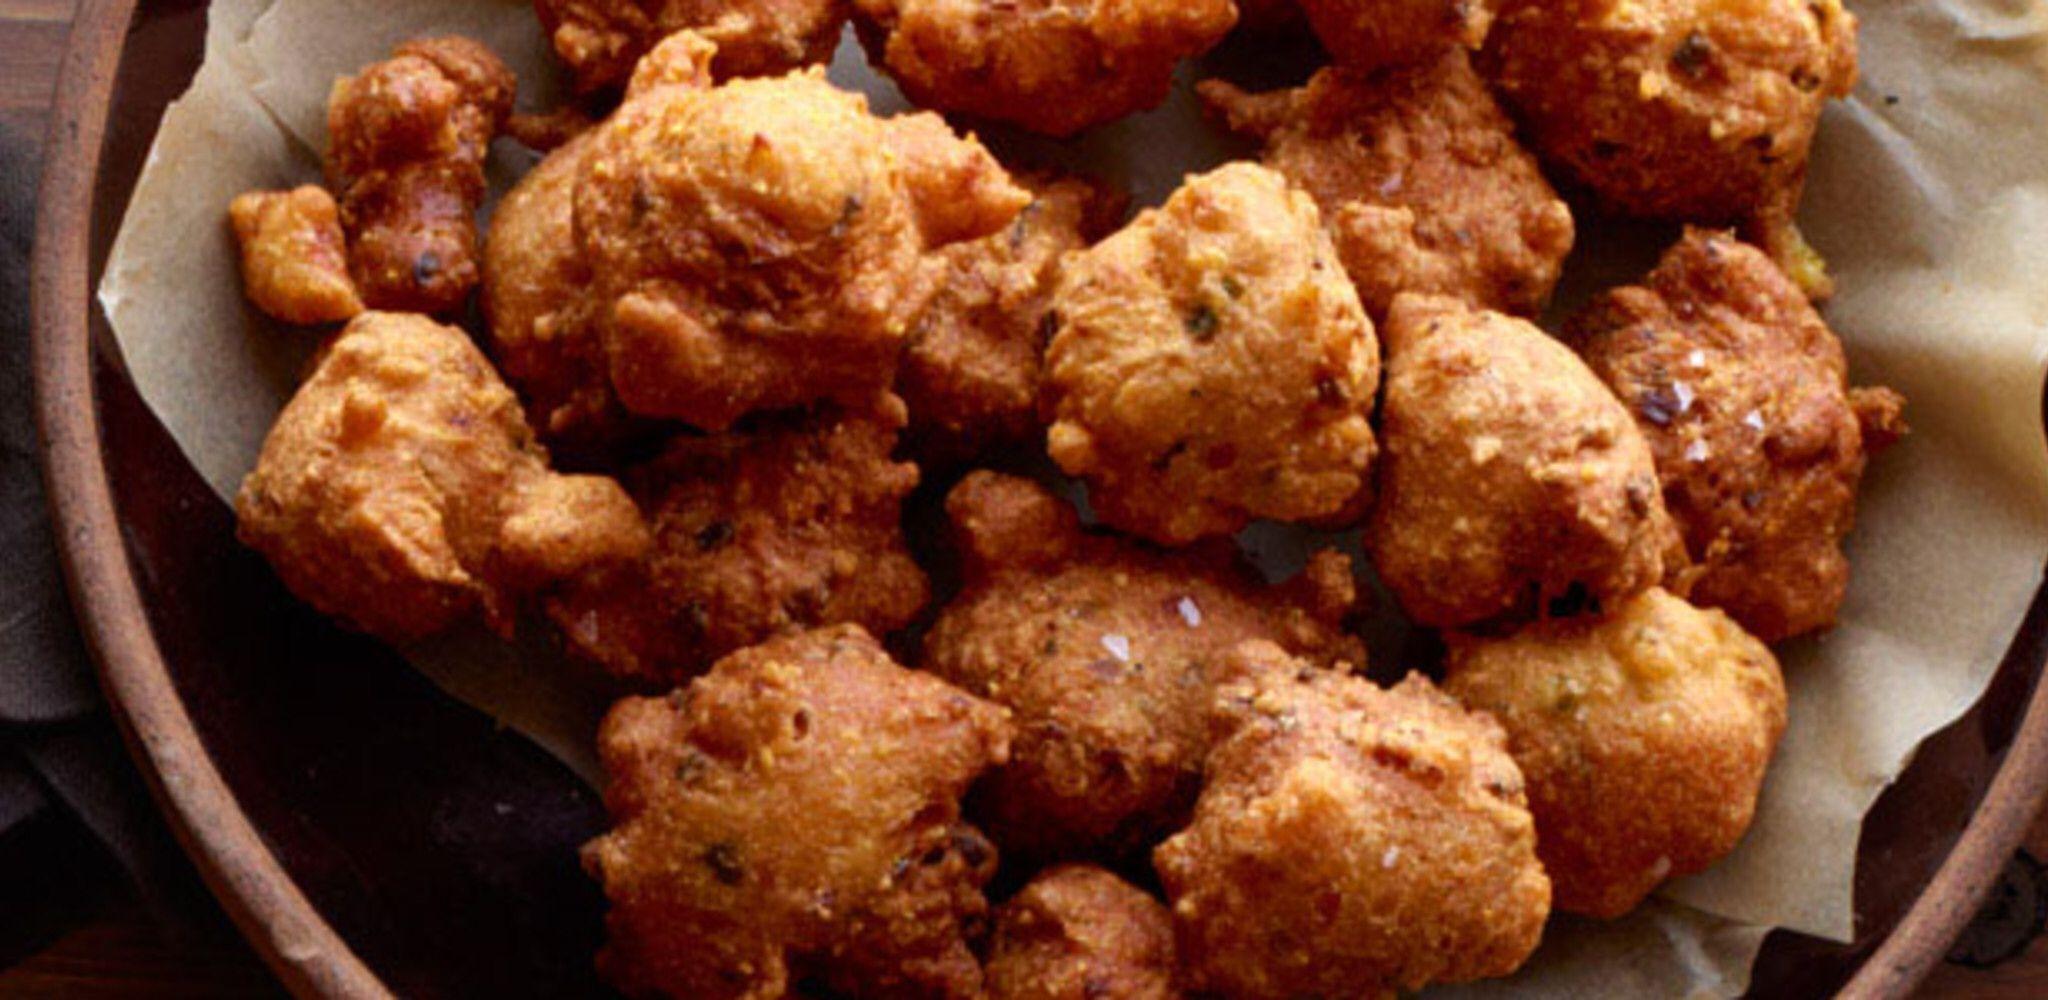 Jalapeno Hushpuppies Recipe Food Network Recipes Recipes Food